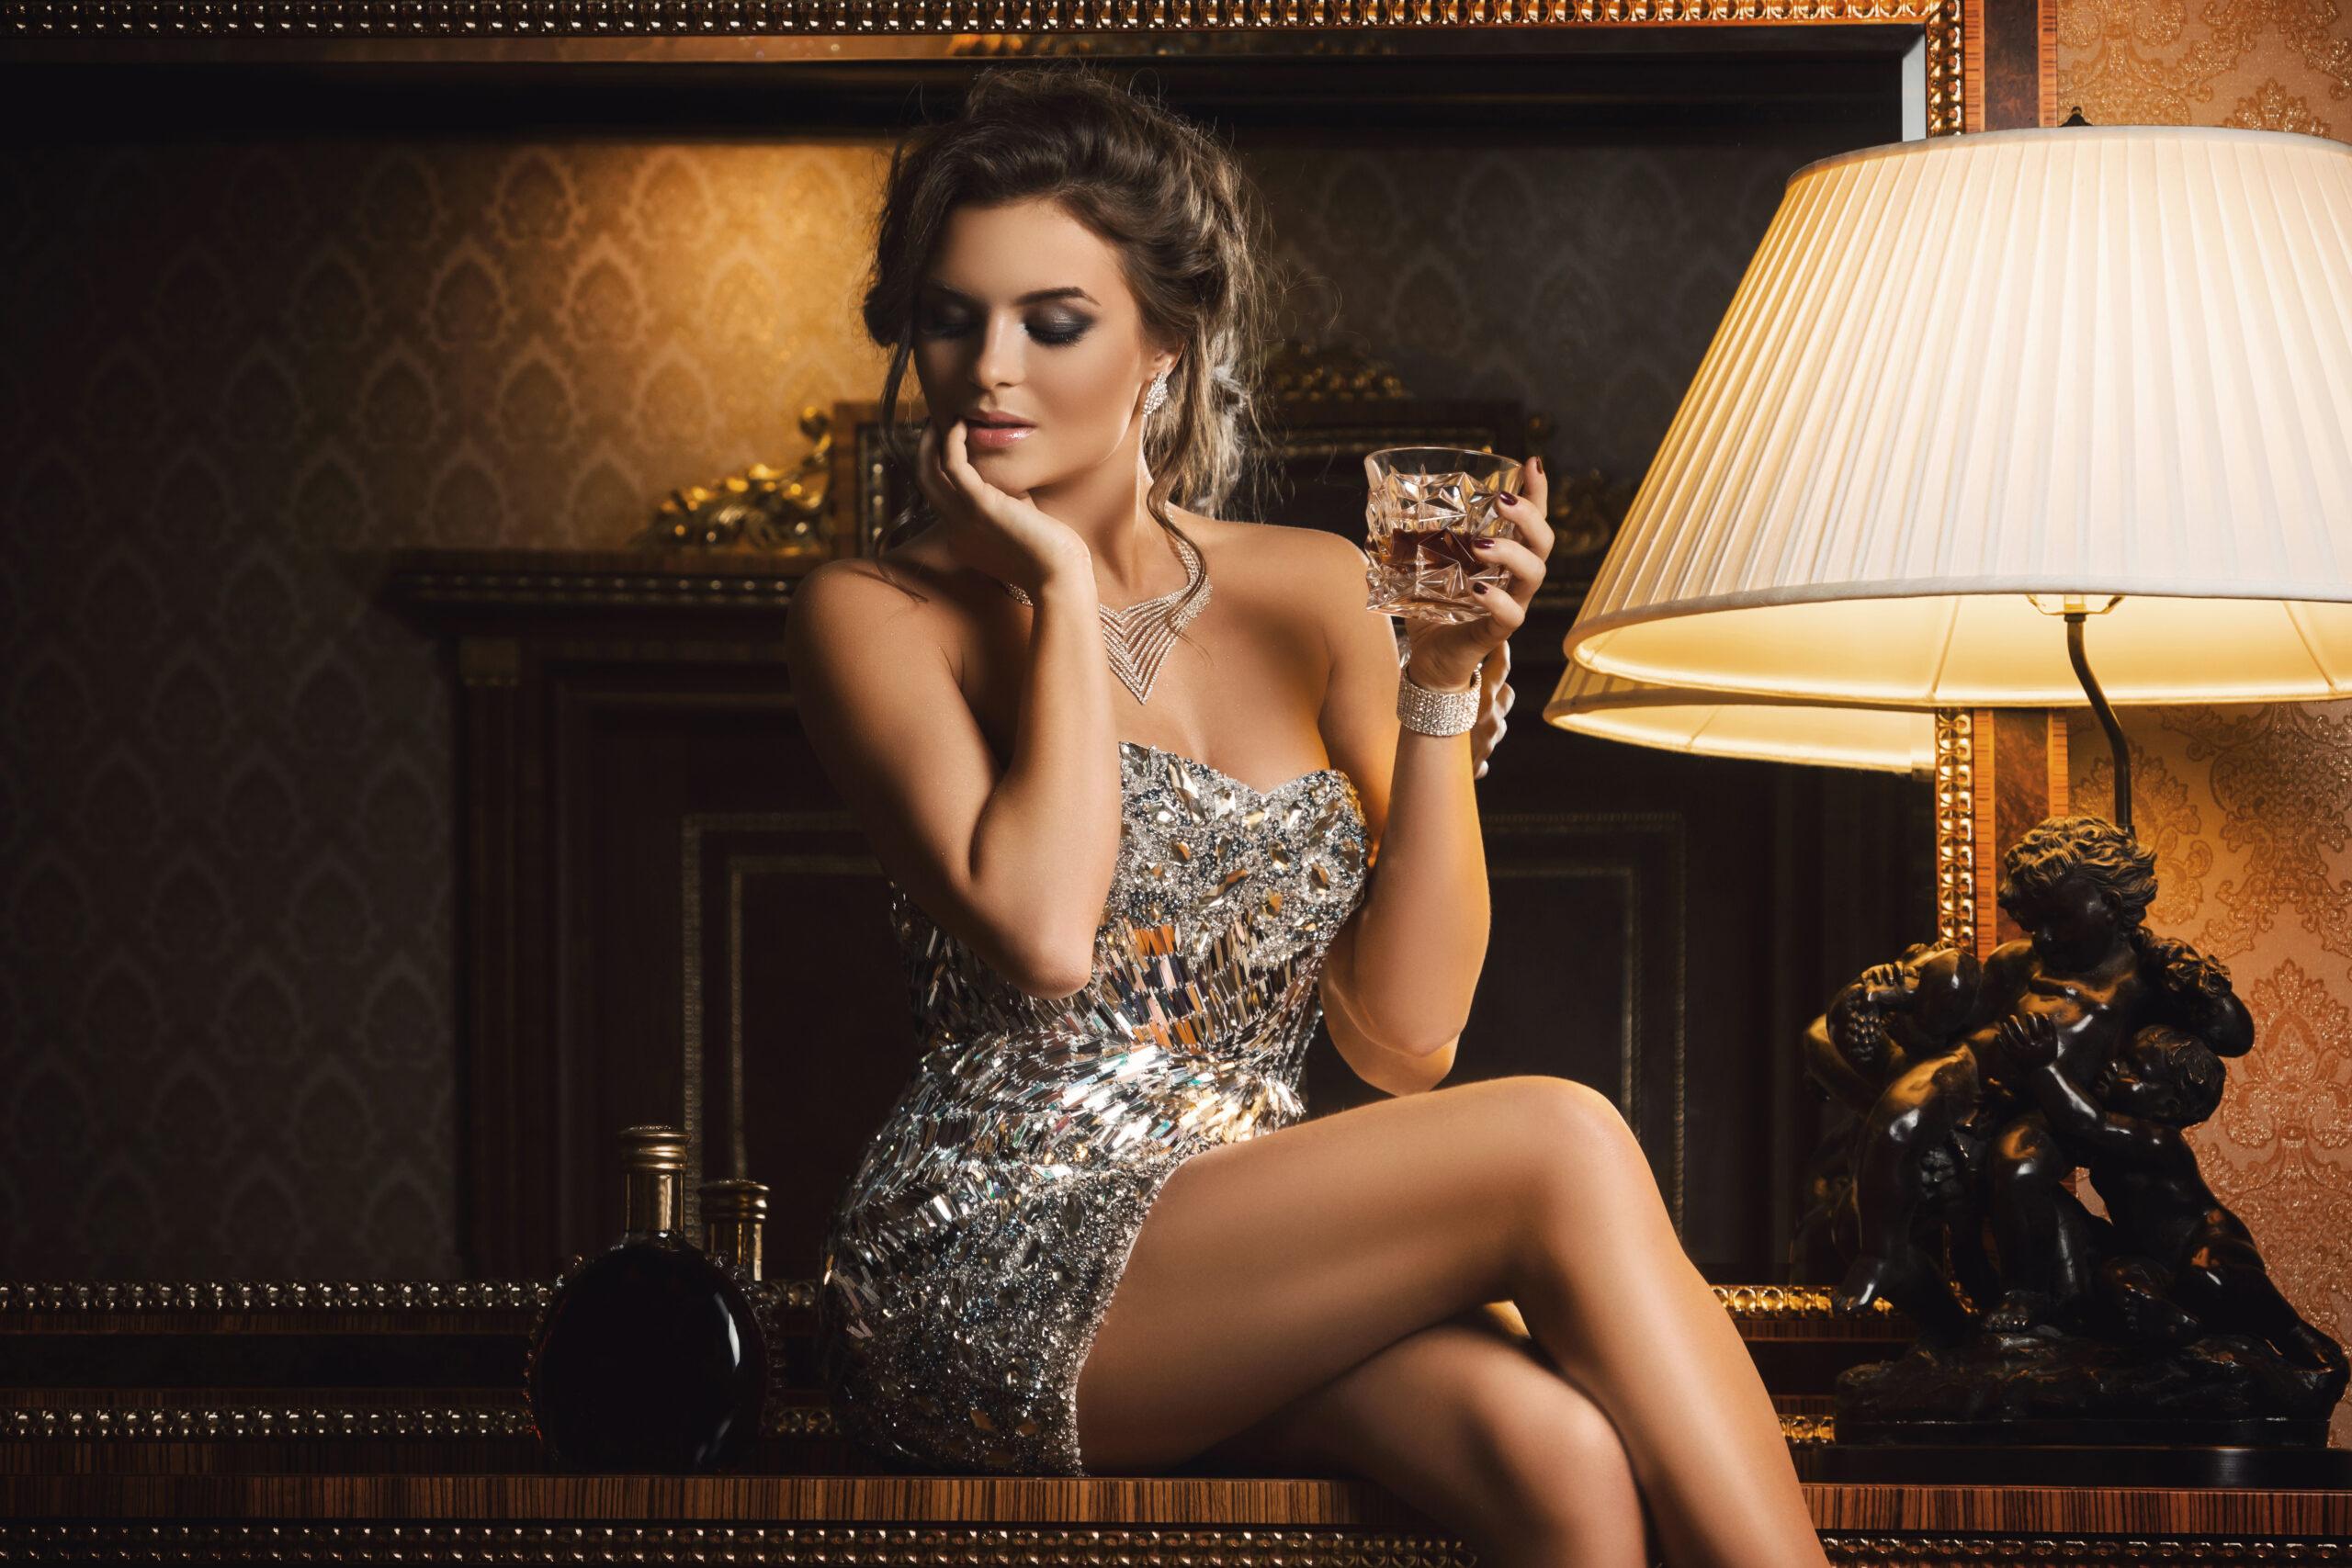 Oscar Night Glamor – Covid Style